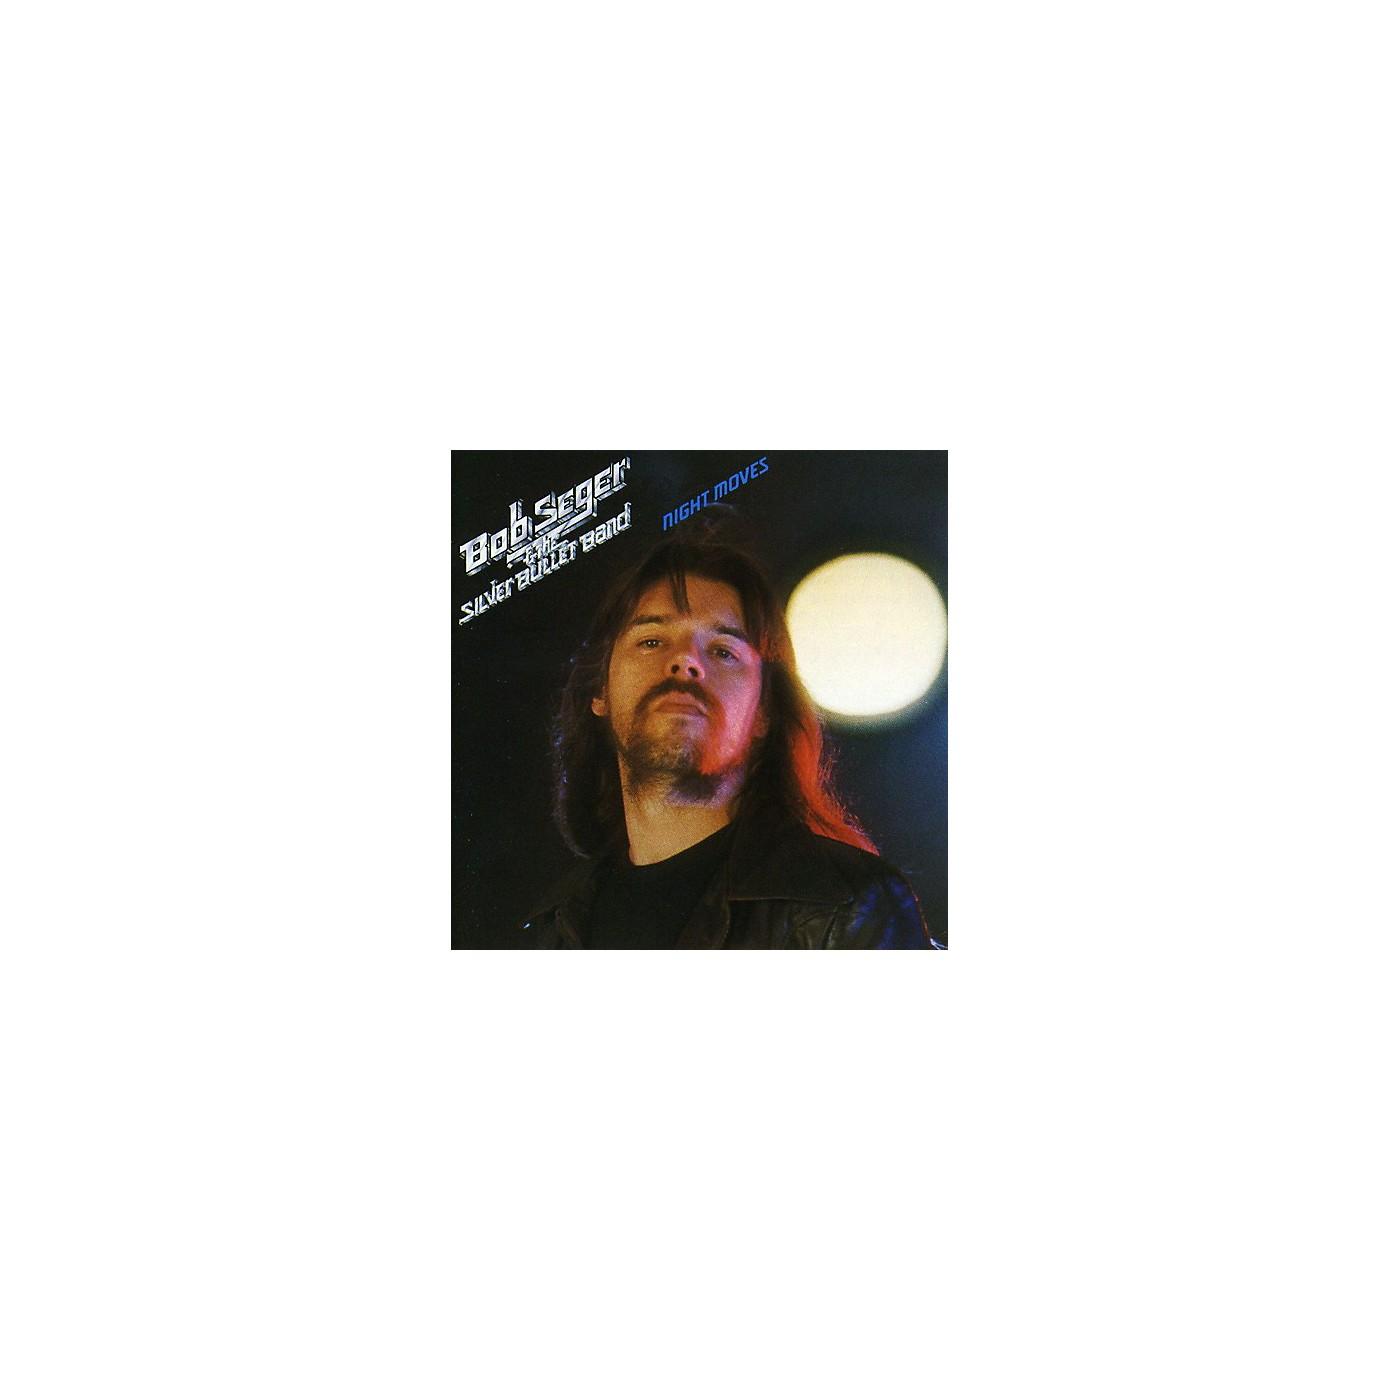 Alliance Bob Seger - Night Moves (CD) thumbnail